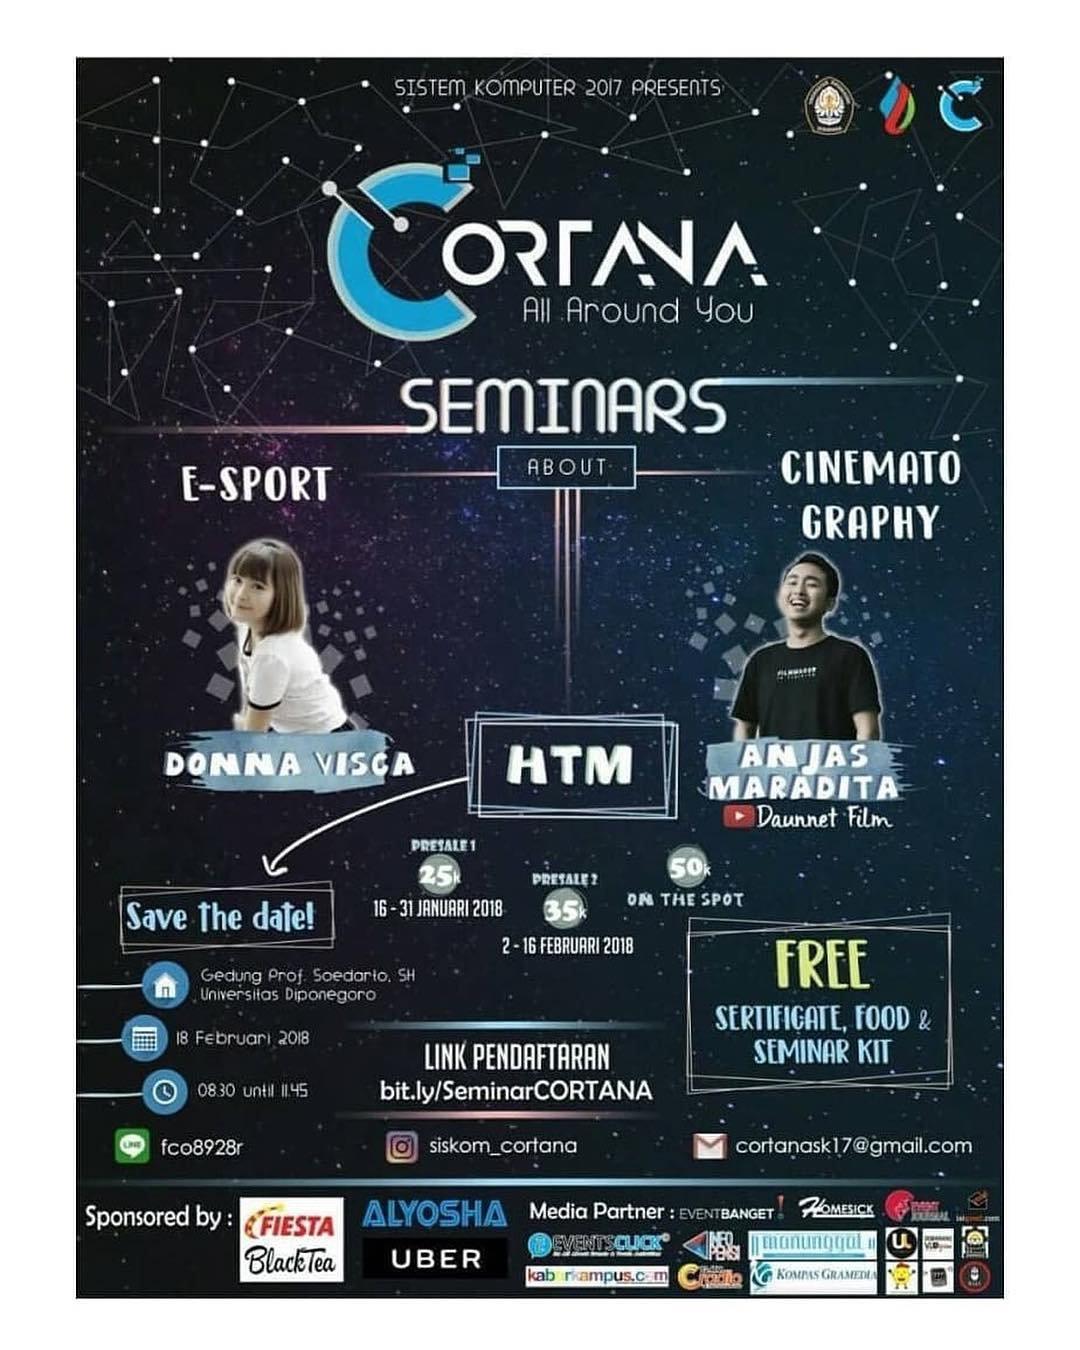 EVENT COMPUTER ENGINEERING TECHNOLOGY AND ART CORTANA DI SEMARANG